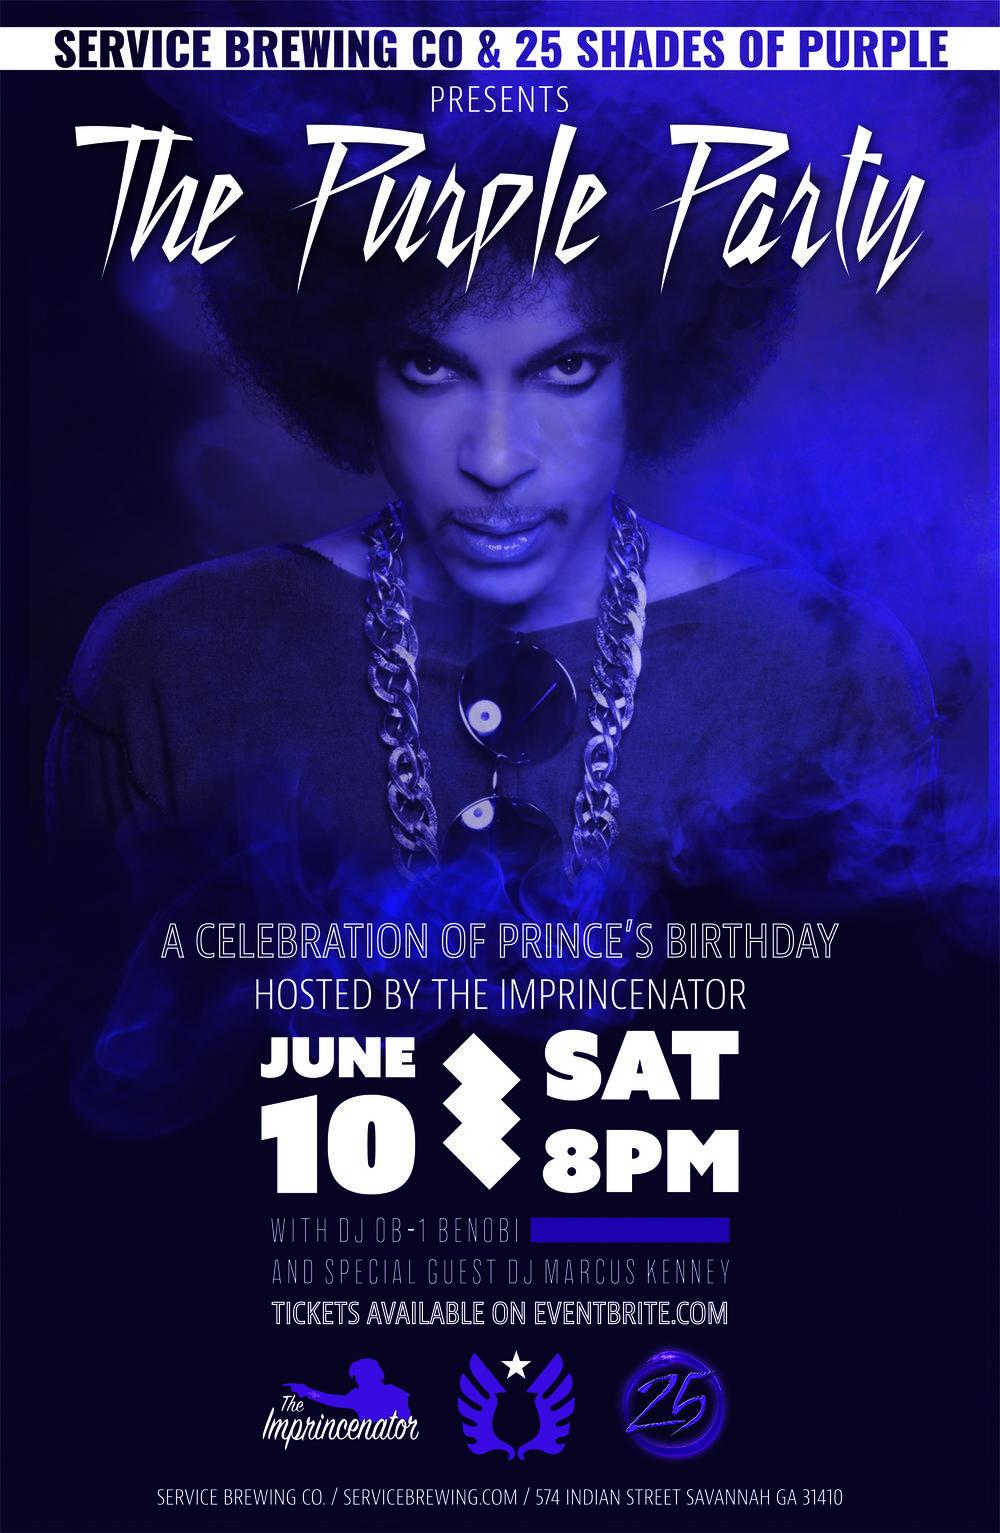 purpleparty_poster-01.jpg